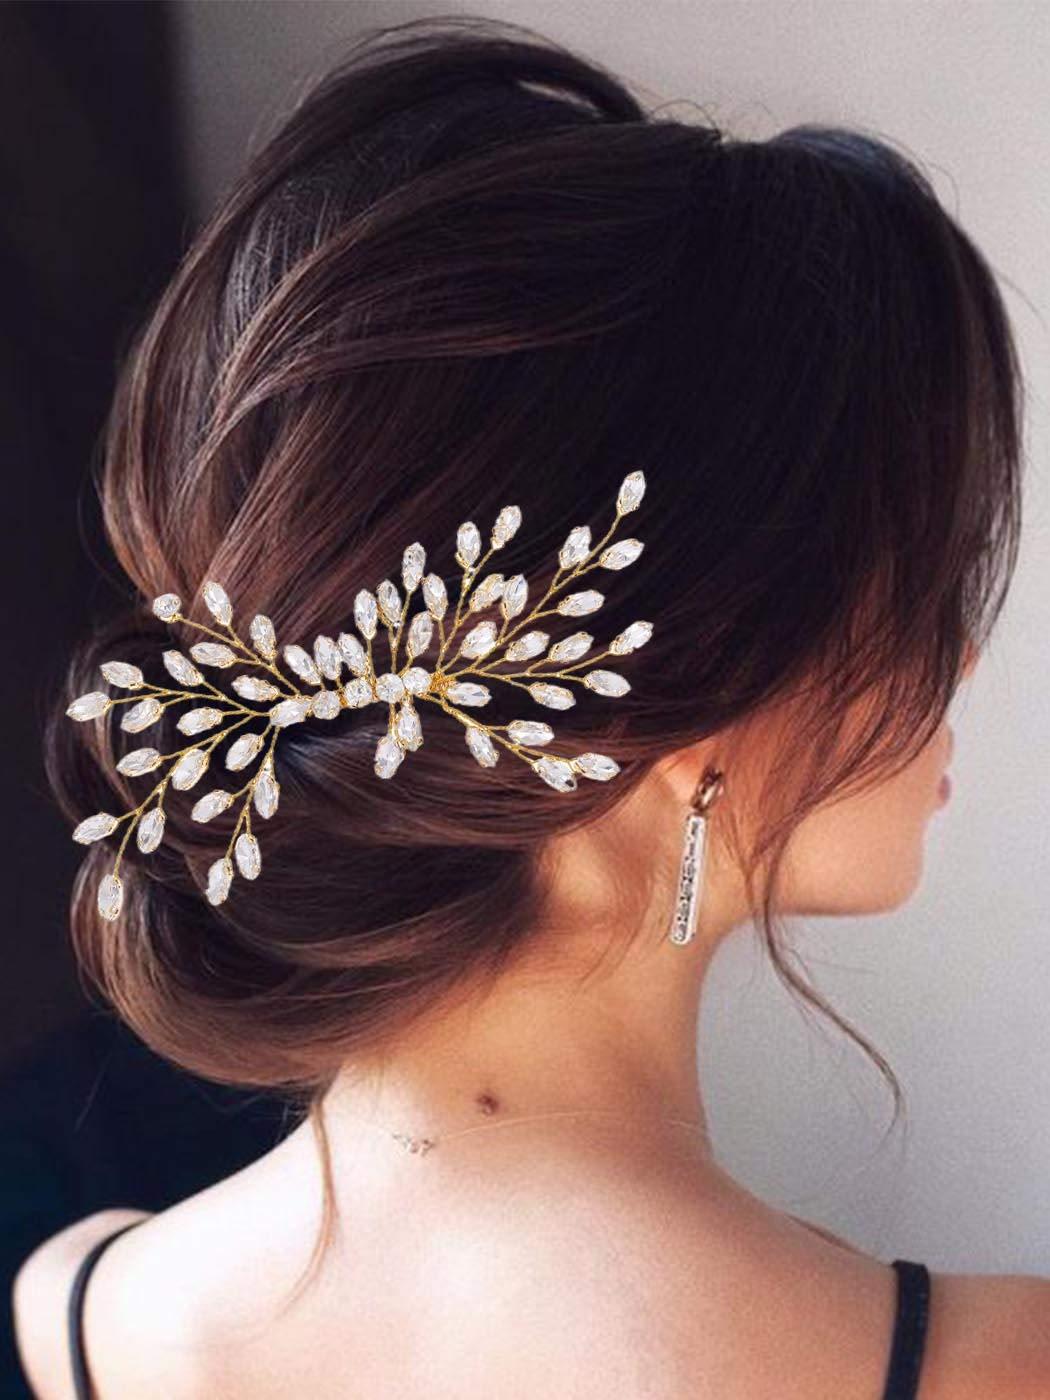 S483 Superbe Femmes Shiny Silver Hair Comb Pin Avec Glitter Blue Wave Line